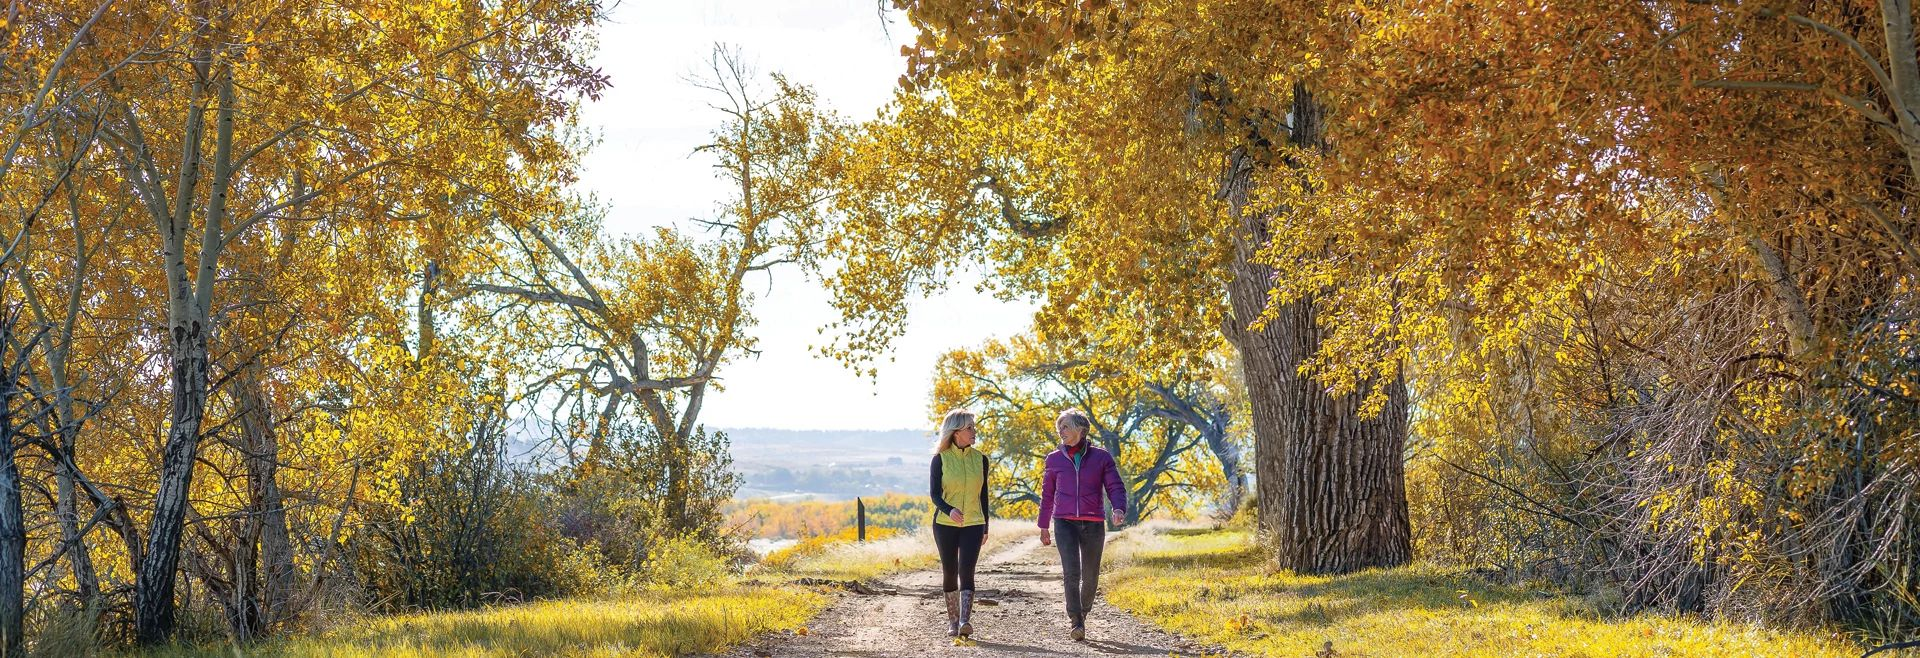 Solstice Lifestyle Friends Walking Trails